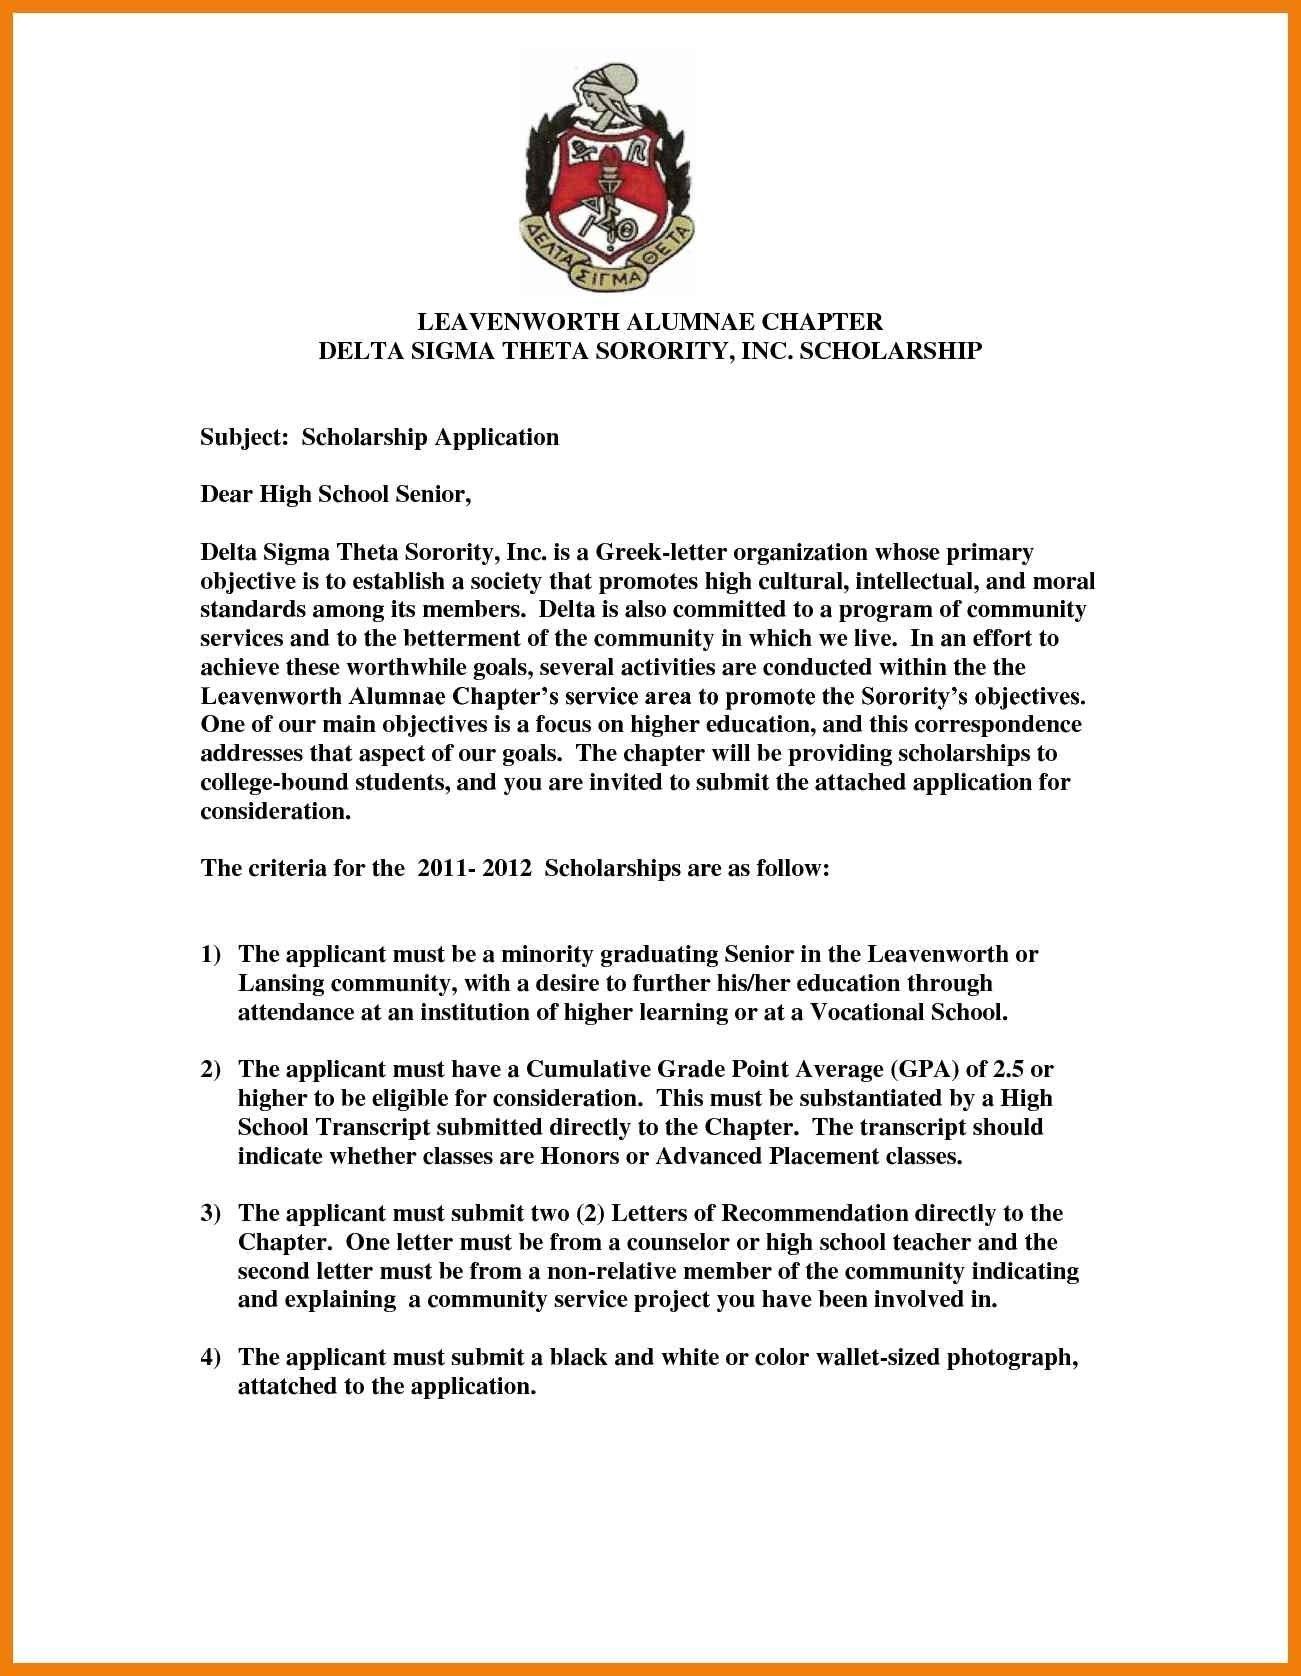 10 Unique High School Service Project Ideas 2 3 community service letter of recommendation covermemo 3